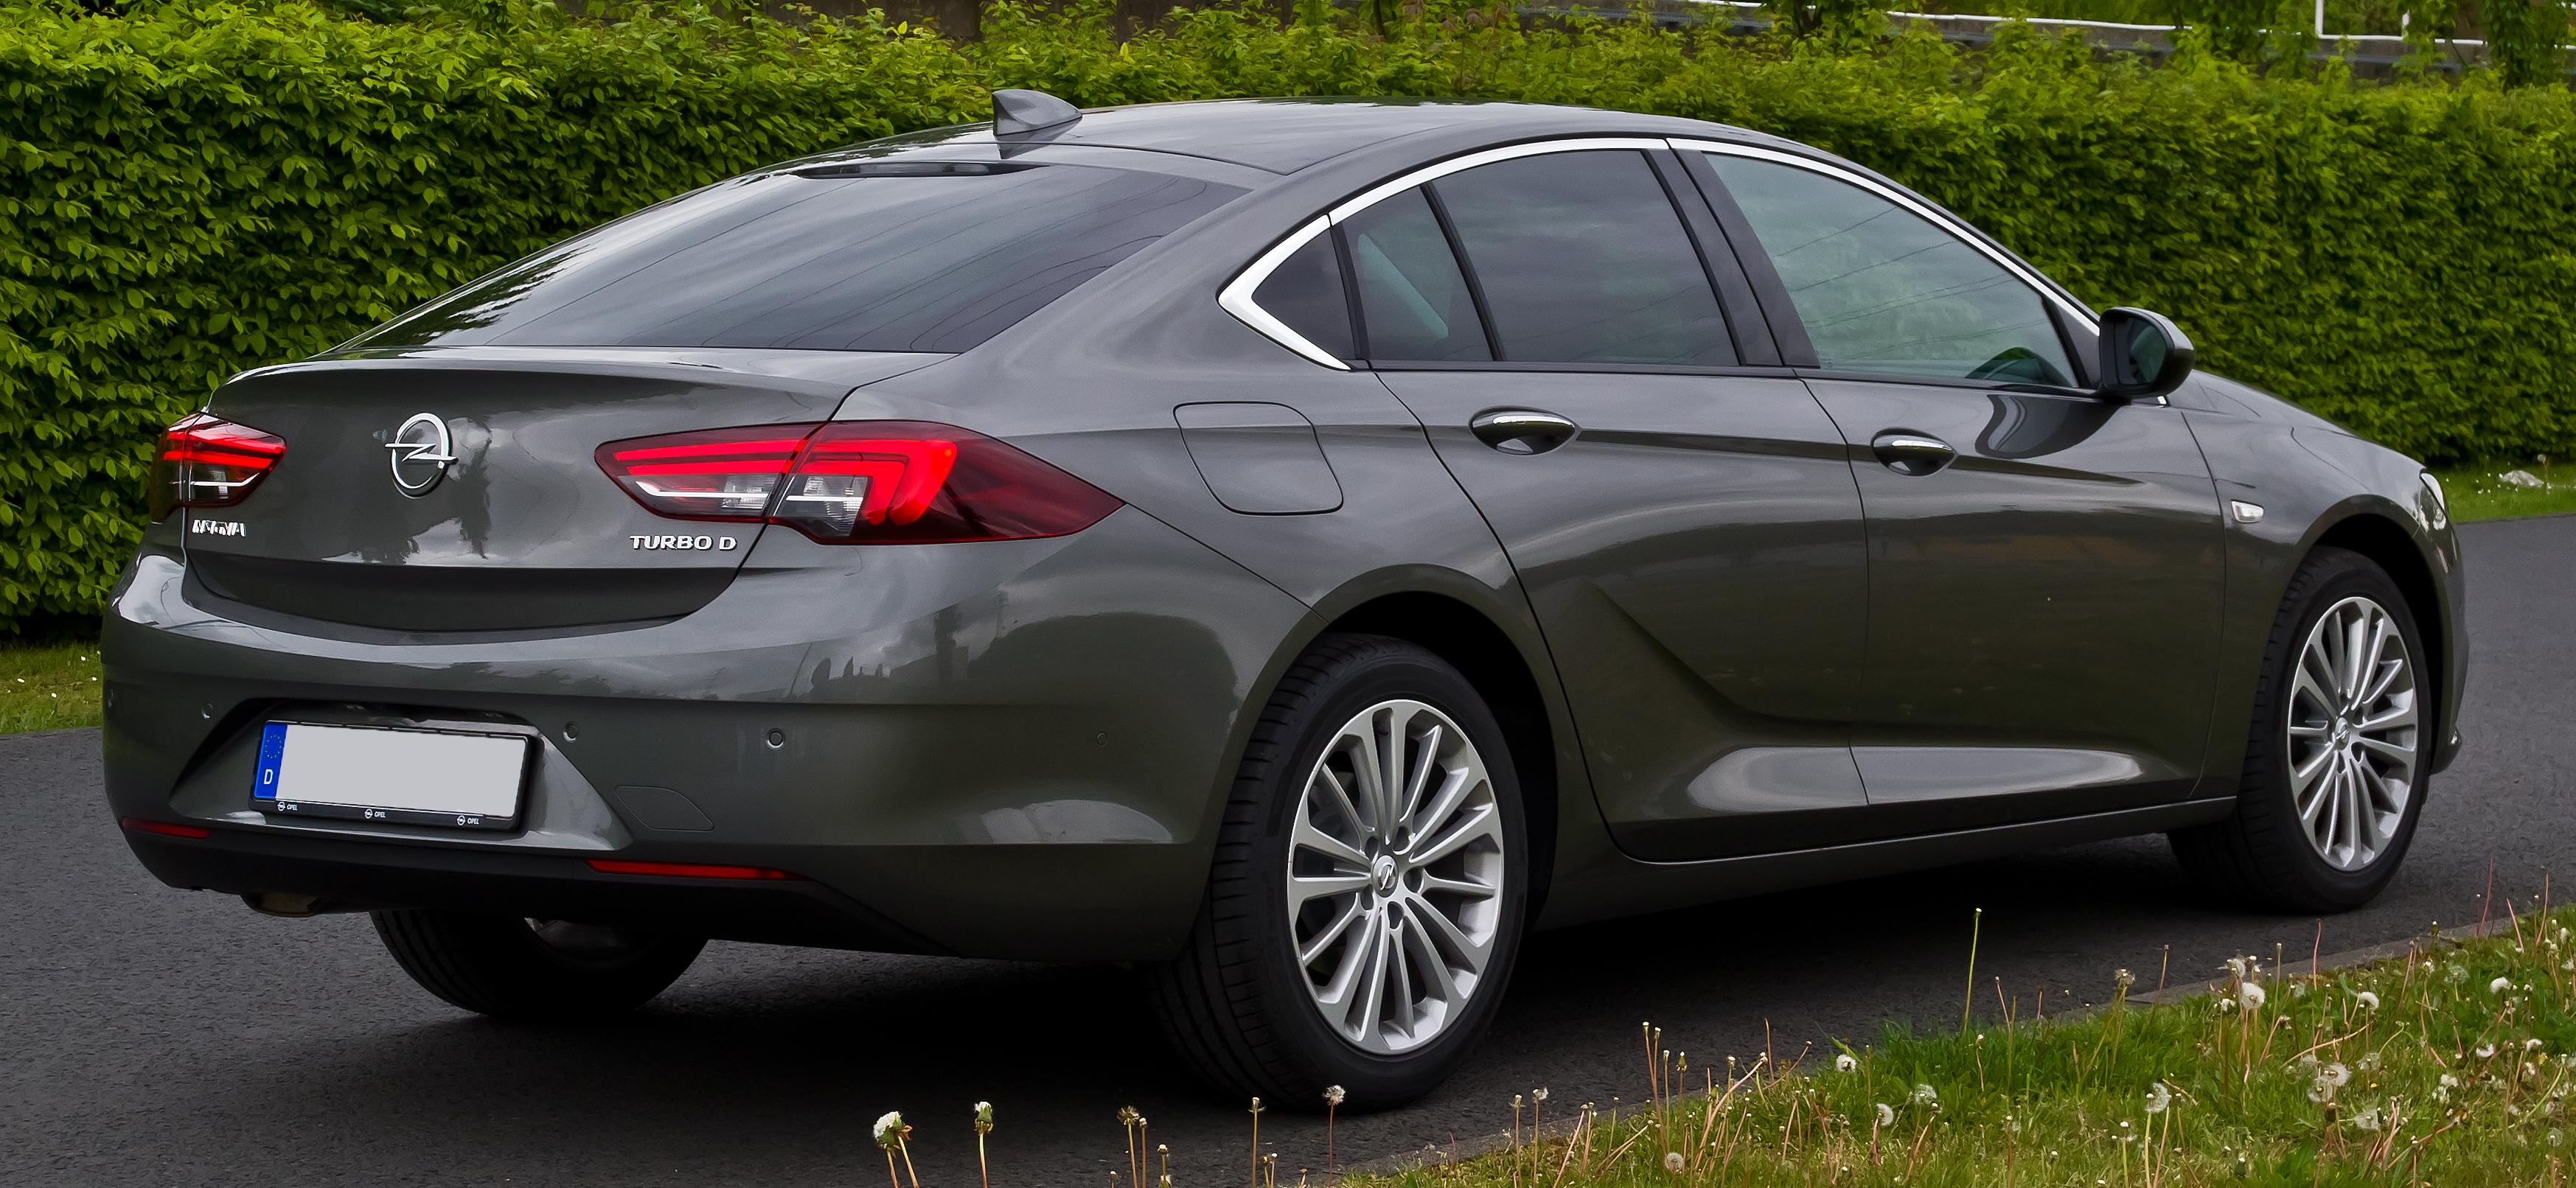 File:Opel Insignia Grand Sport 1.6 Diesel Business Innovation (B) – Heckansicht, 5. Mai 2017 ...